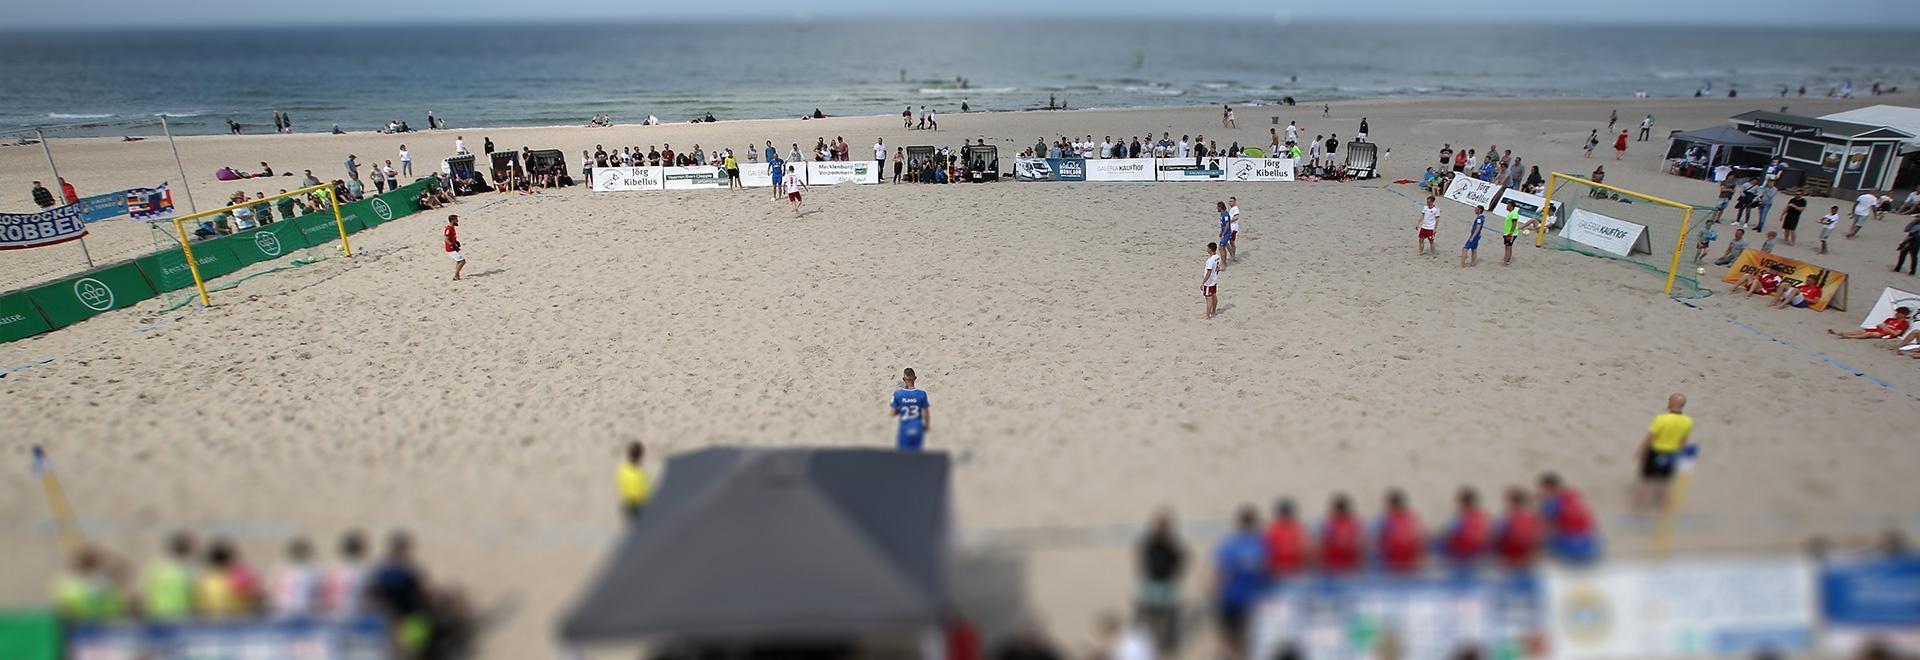 Italia Beach Soccer Tour